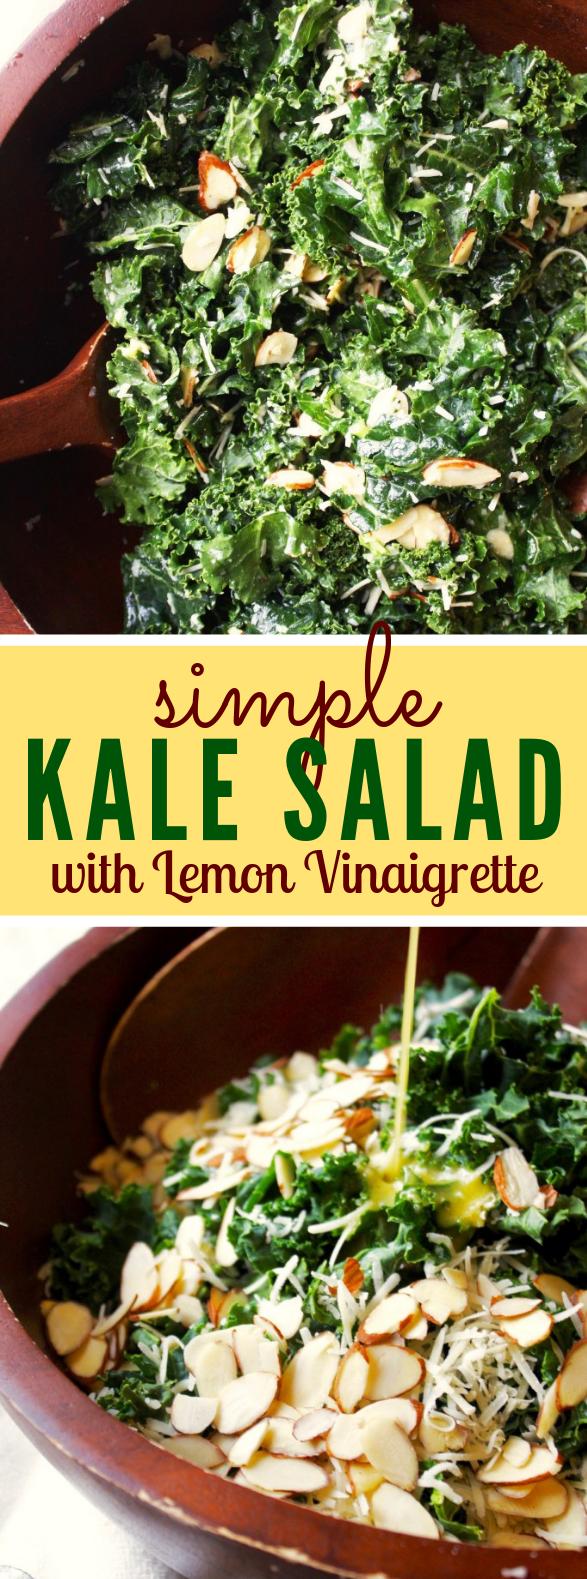 SIMPLE KALE SALAD WITH LEMON VINAIGRETTE #vegetarian #eating